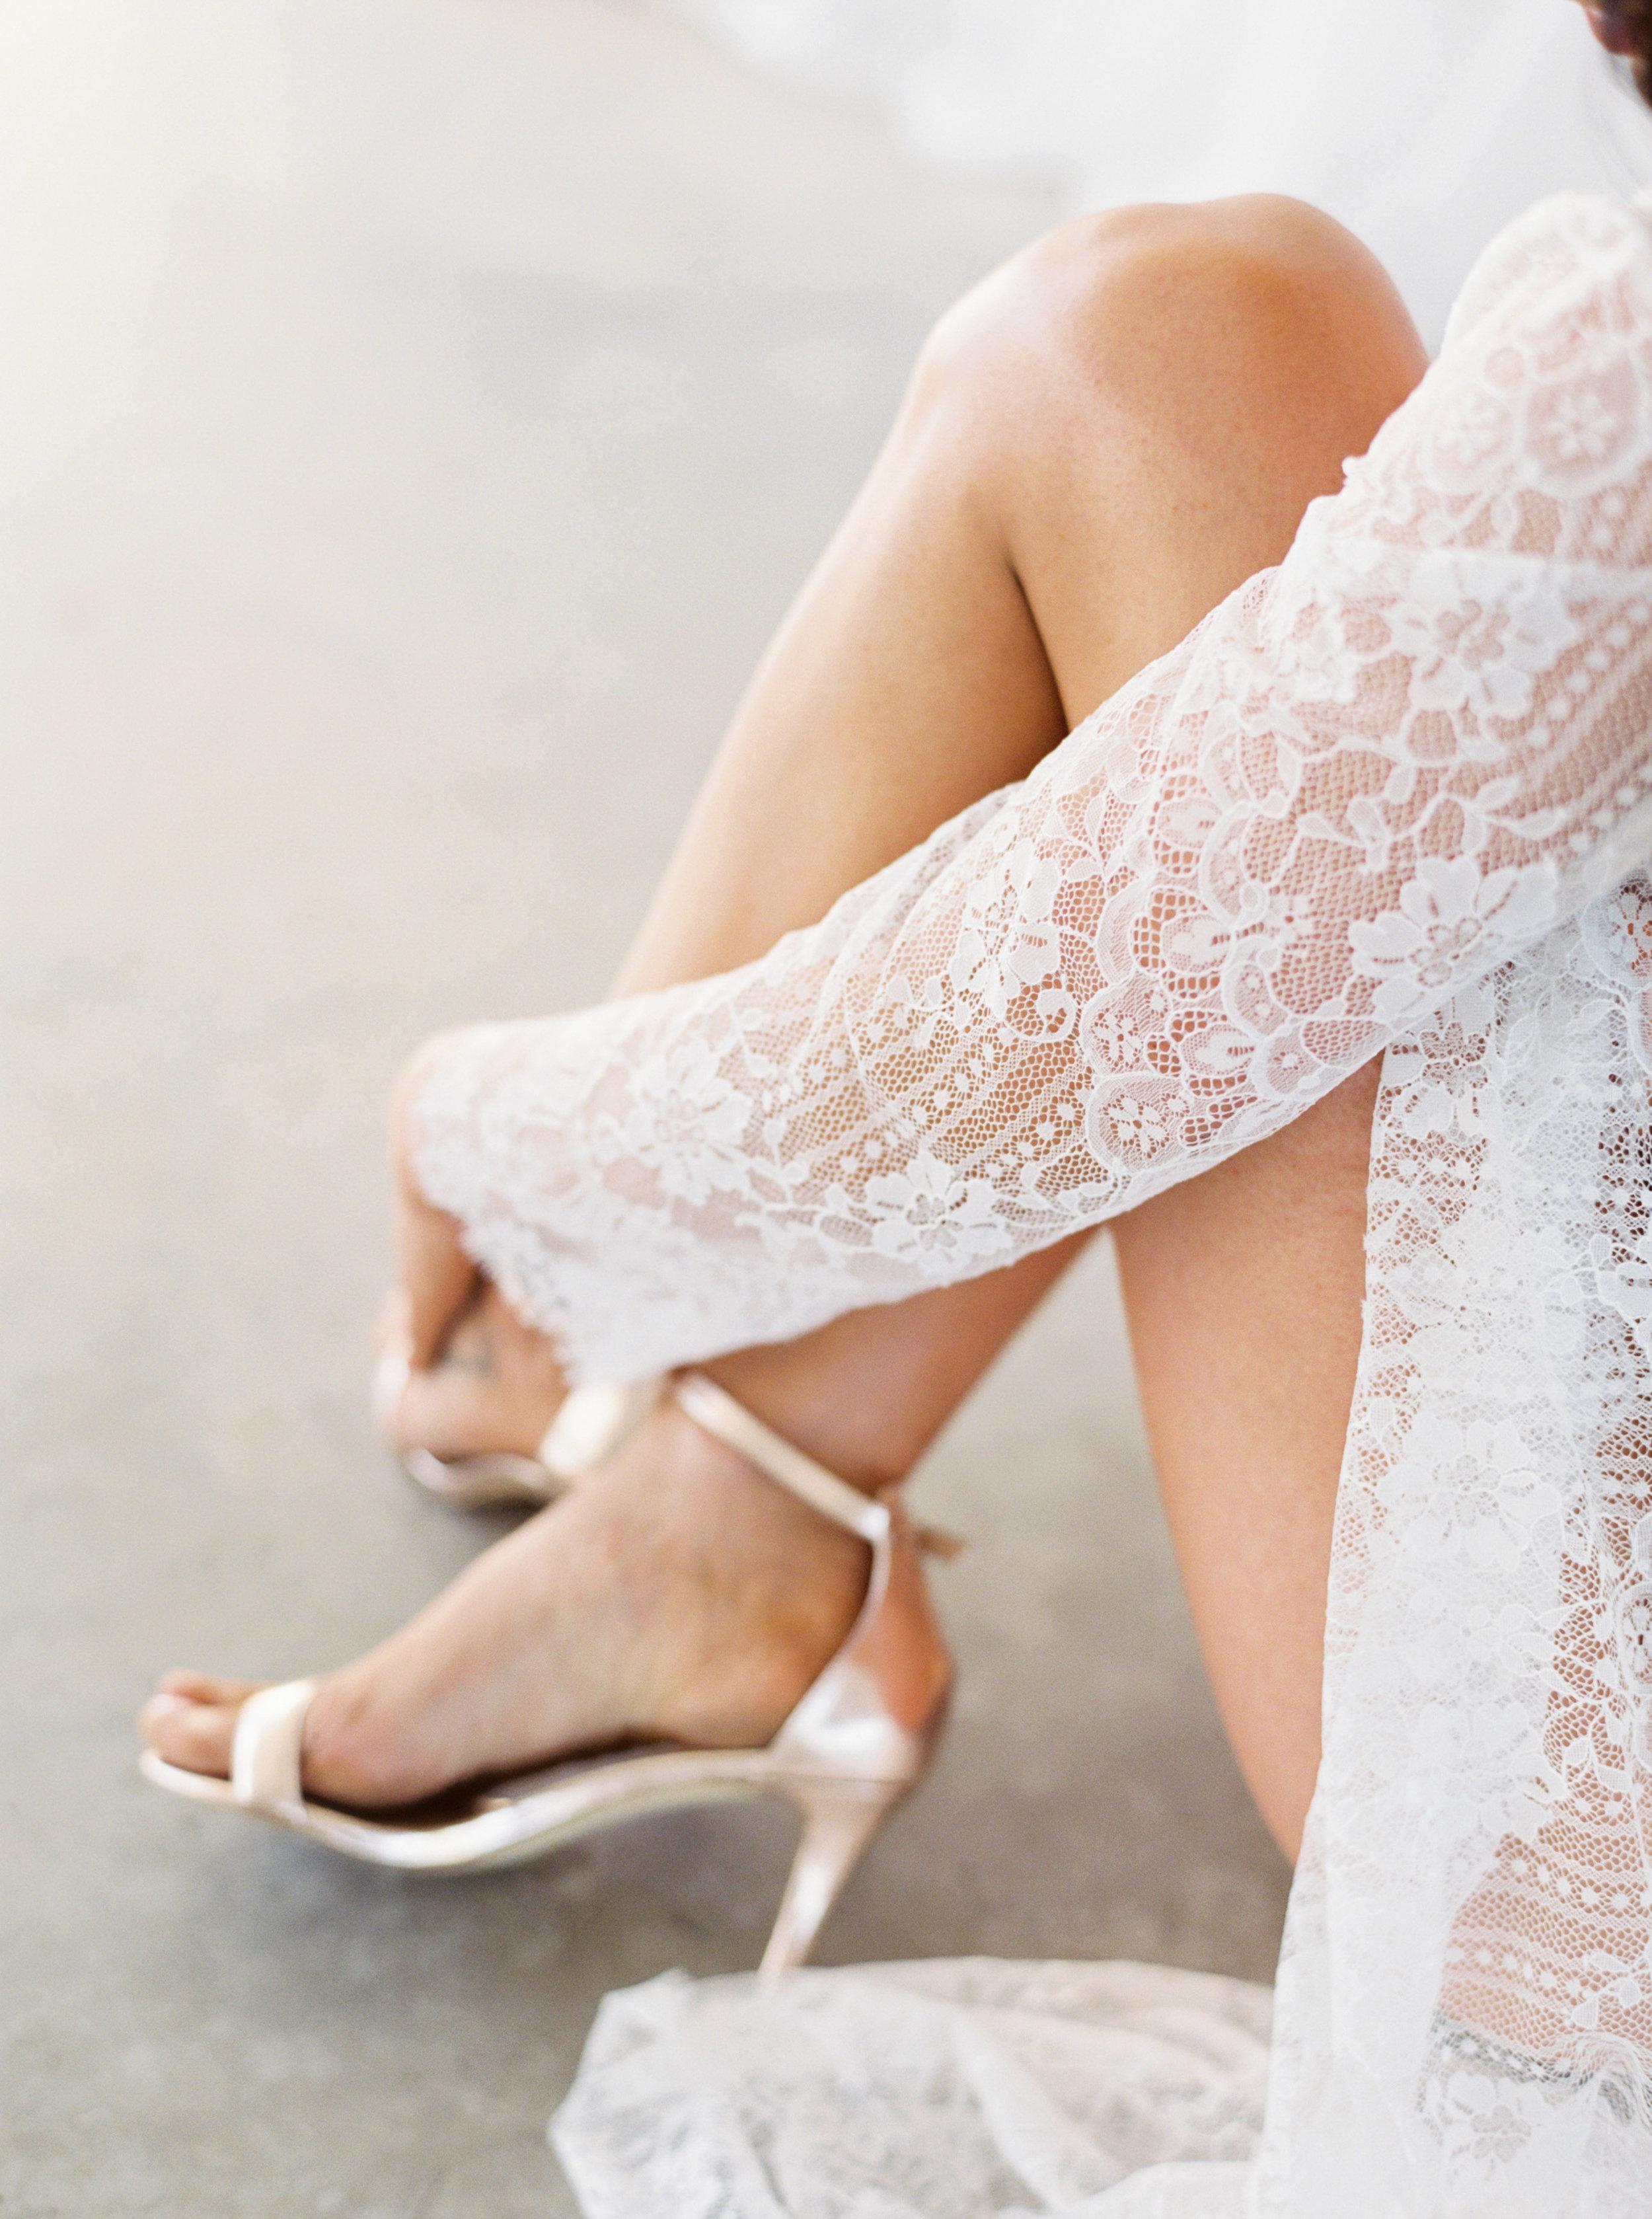 00012- Mudgee Wedding Photographer Sheri McMahon.jpg